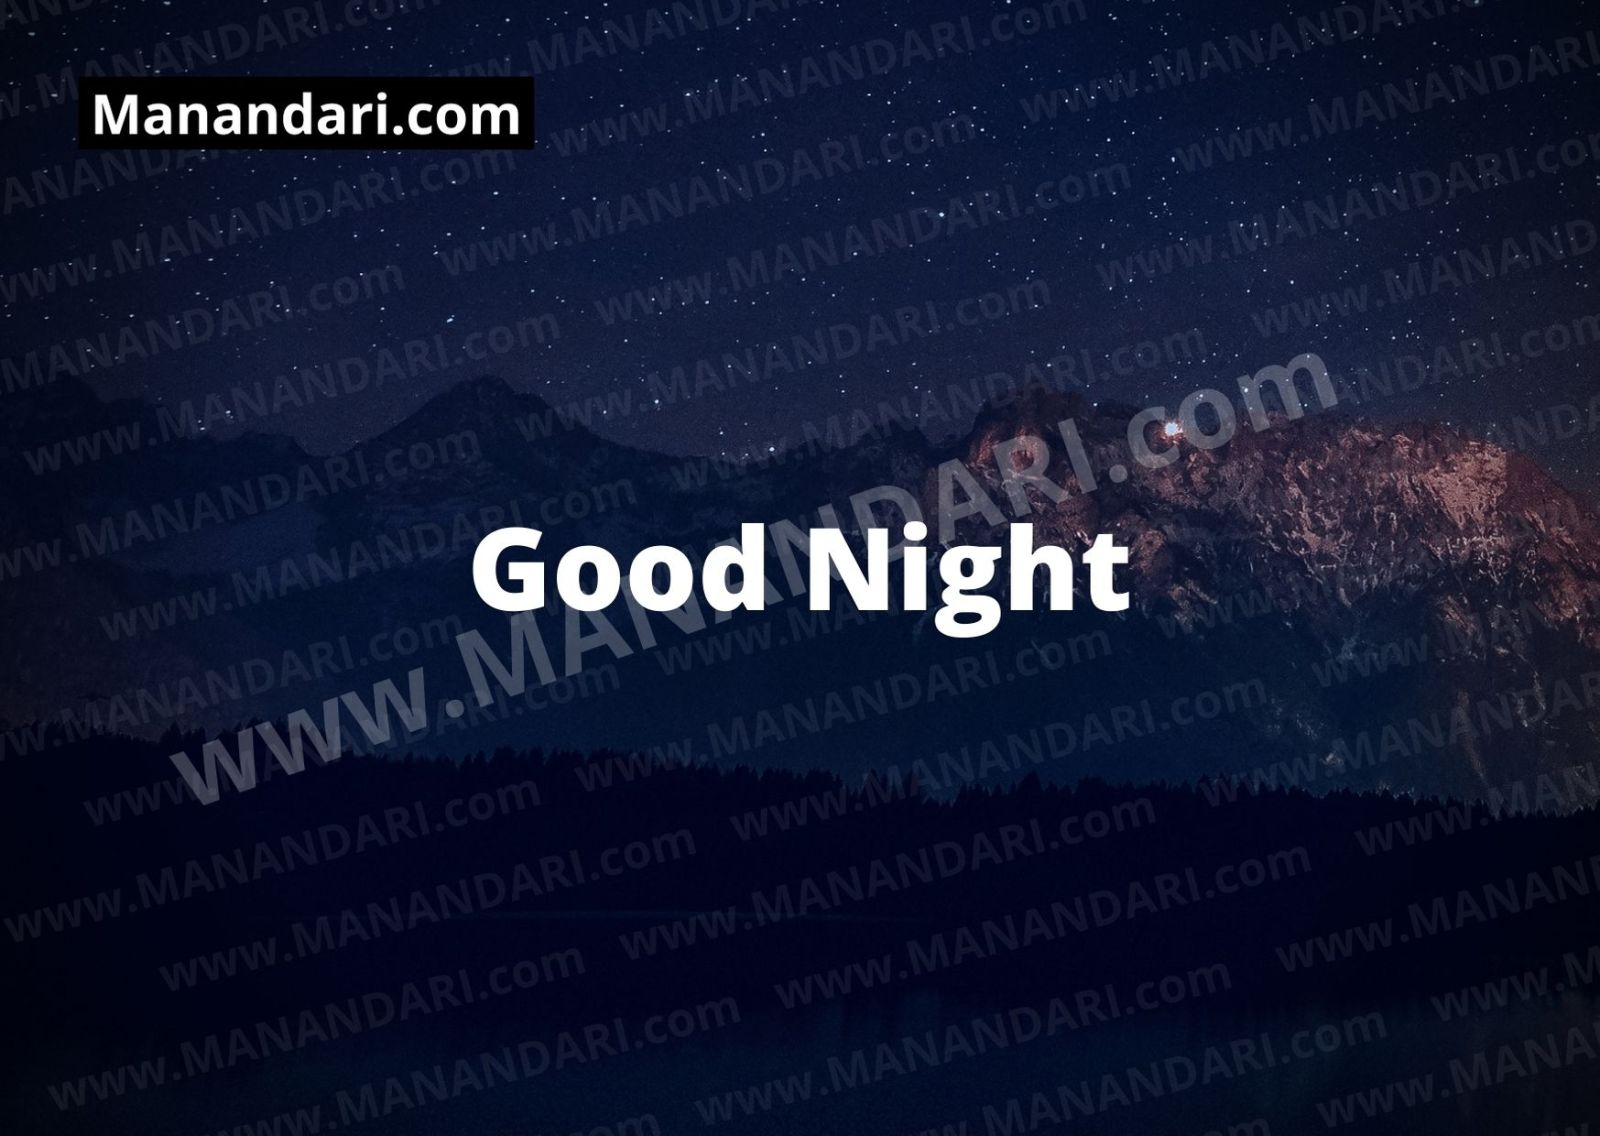 Good Night - 10